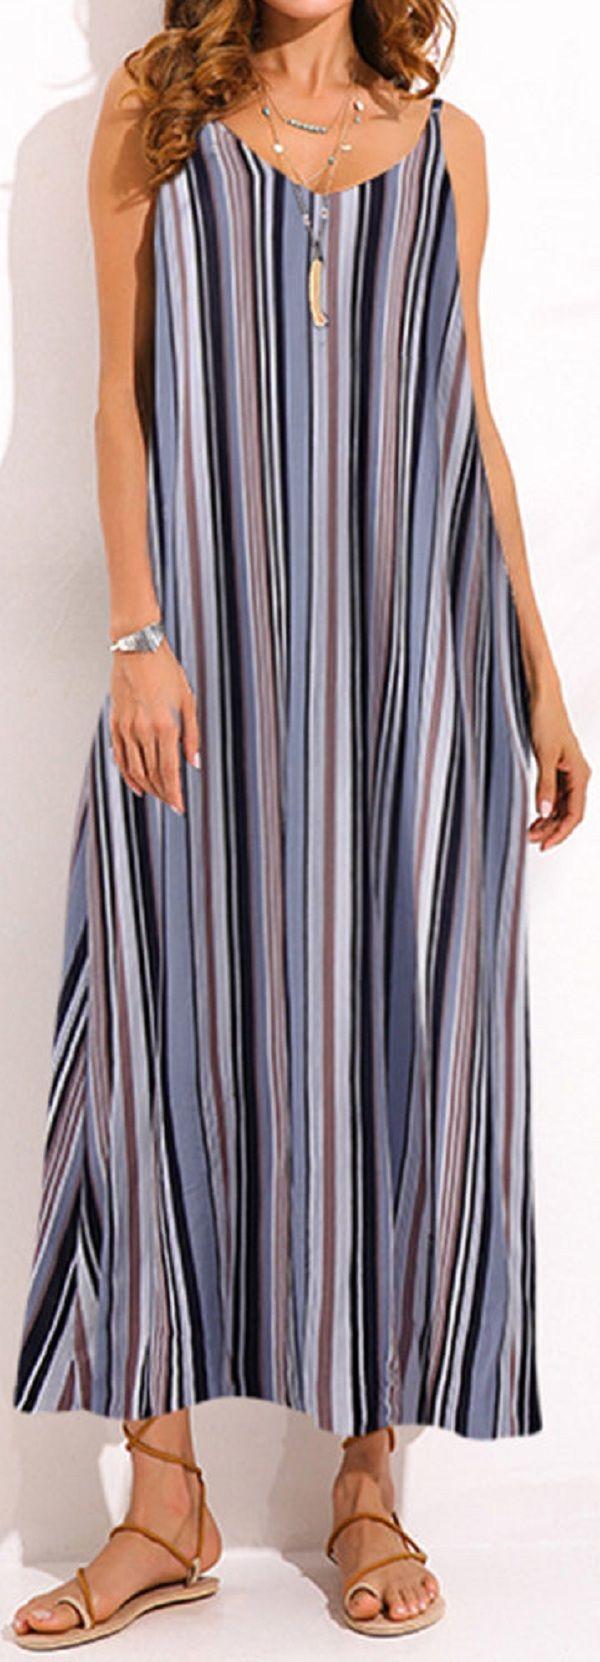 US$ 20.54 O-NEWE Bohemian Women Stripe Spaghetti Strap Backless Beach Maxi Dress